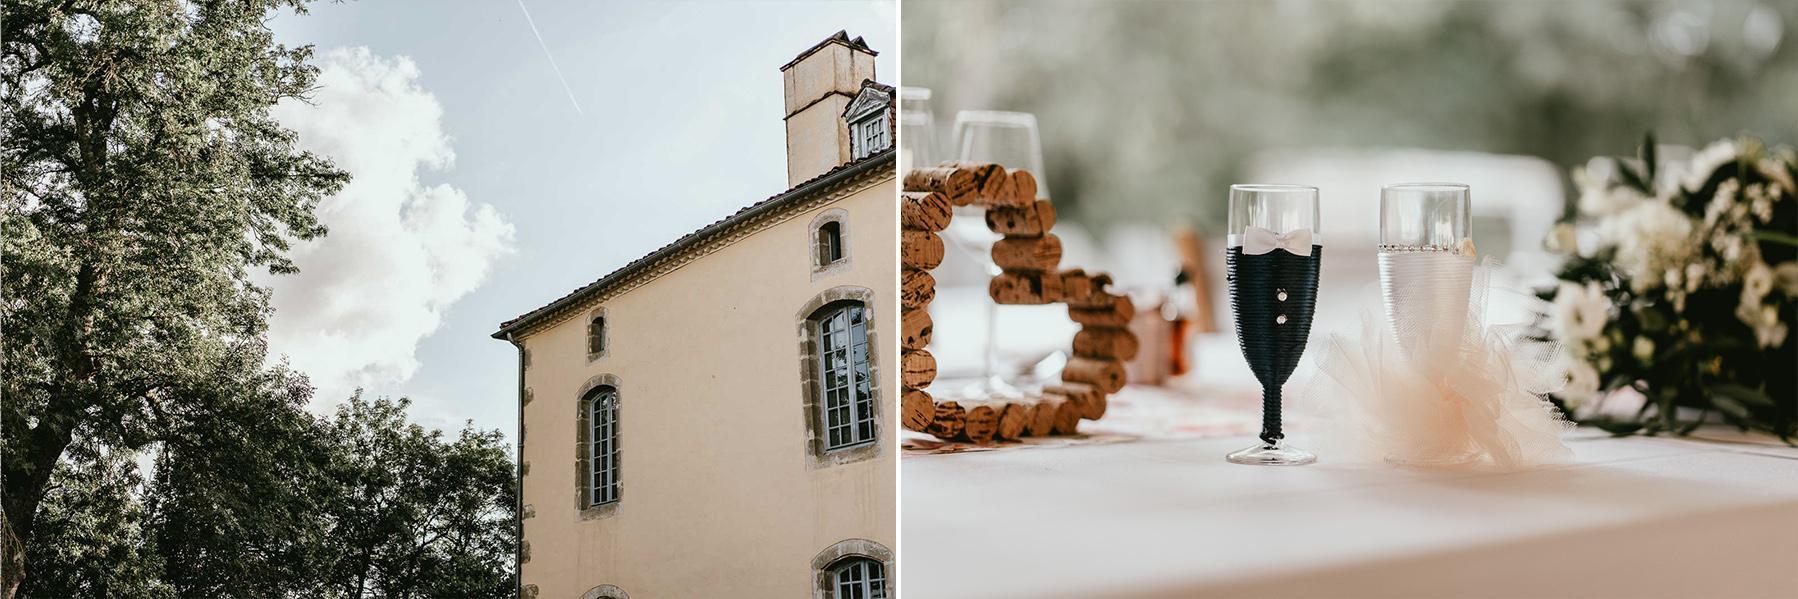 Photographe mariage landes chateau lupiac 8